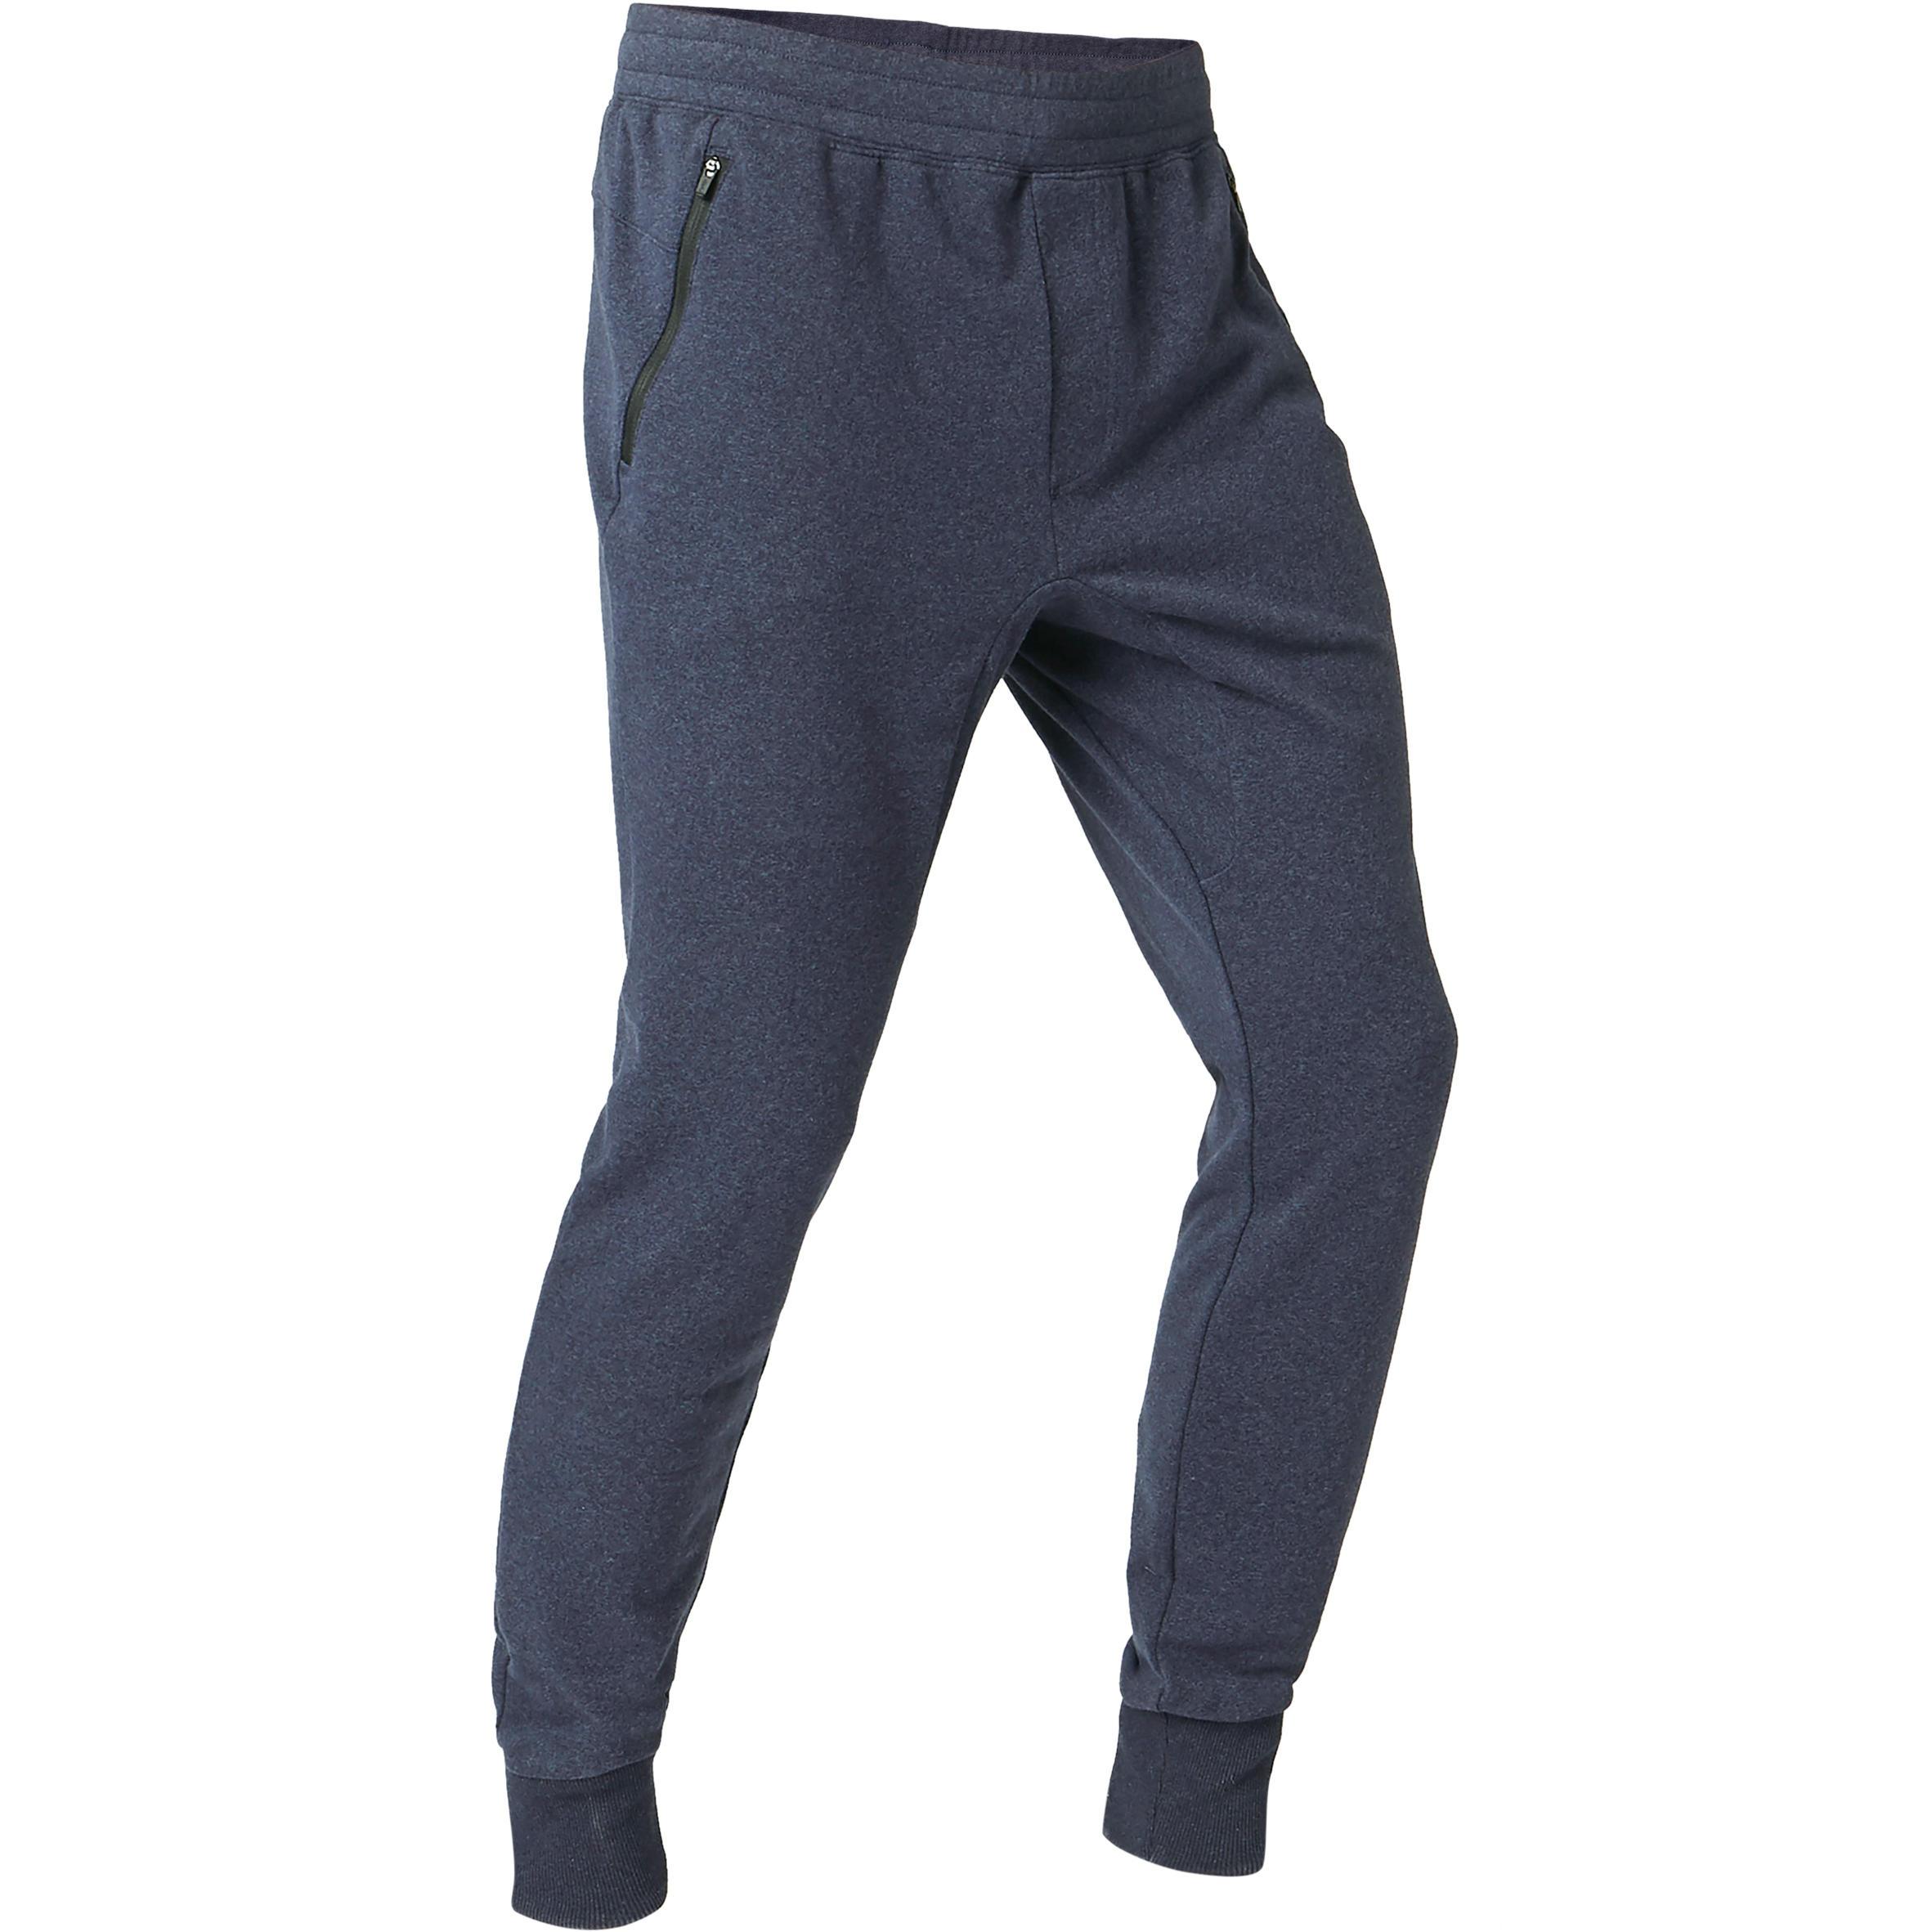 Jogginghose 500 Skinny Zip Pilates sanfte Gymnastik Herren blau   Sportbekleidung > Sporthosen > Jogginghosen   Blau   Domyos